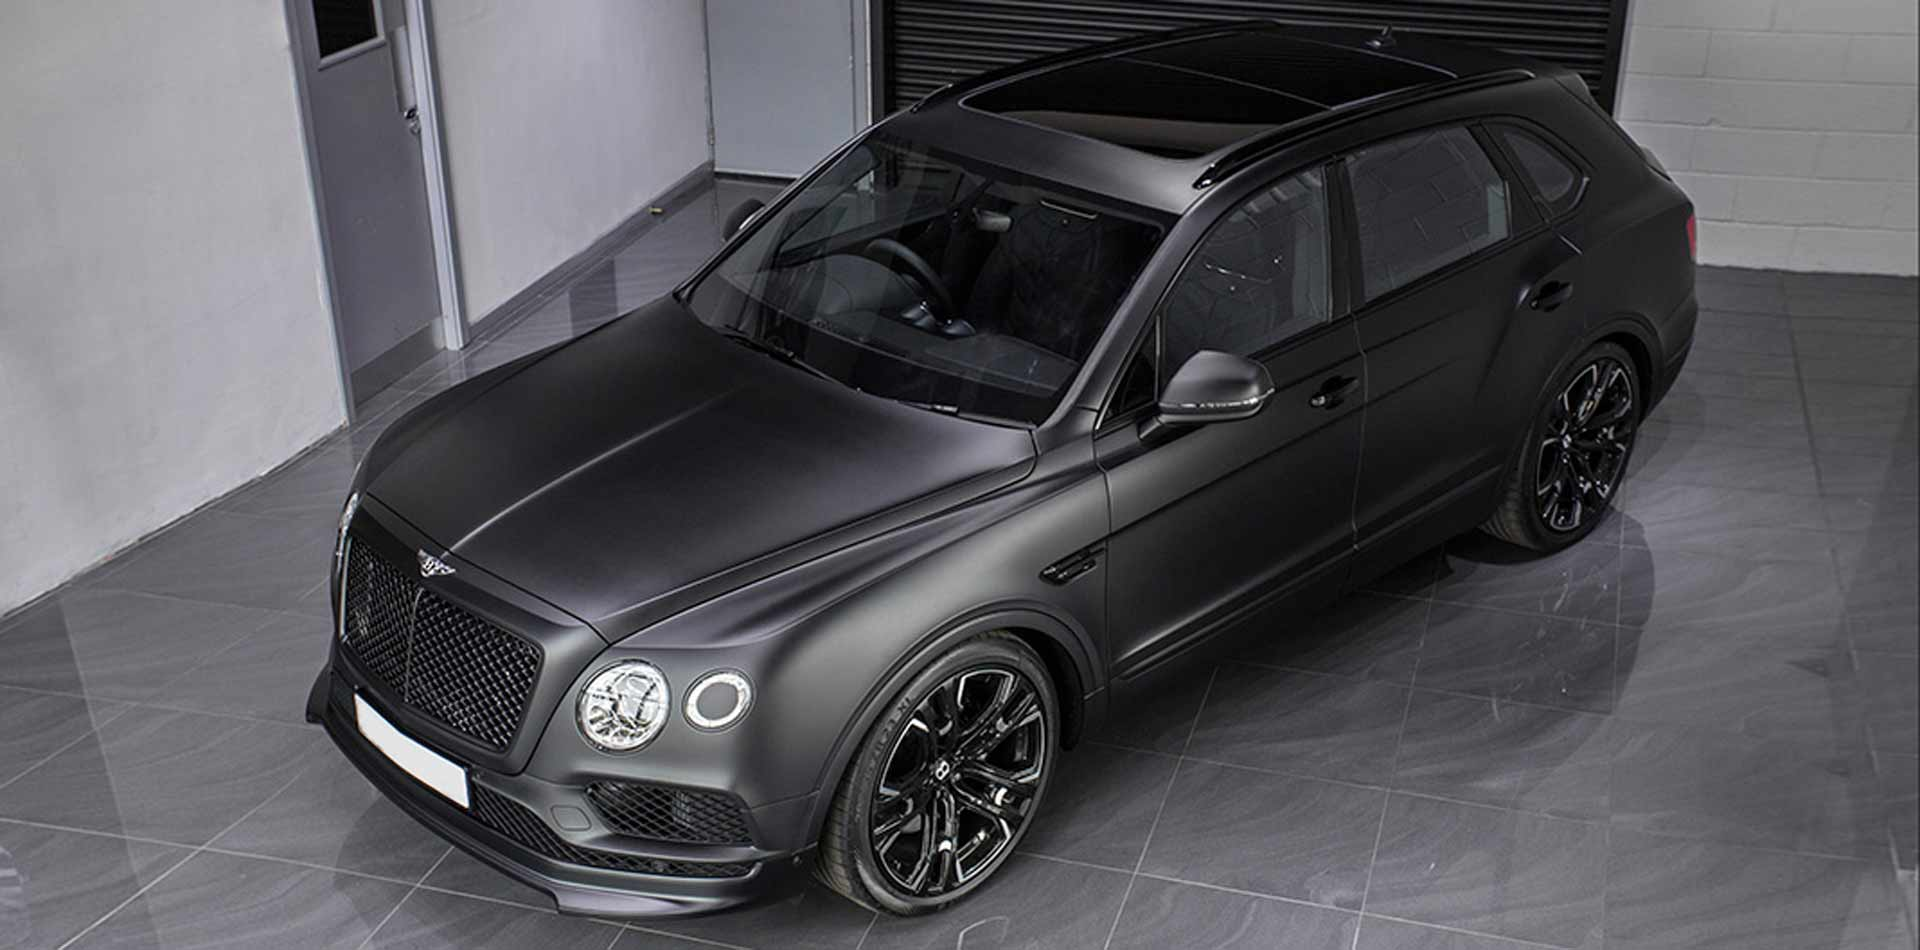 Dezentes Tuning am Bentley Bentayga mit Tieferlegung und 23 Zoll